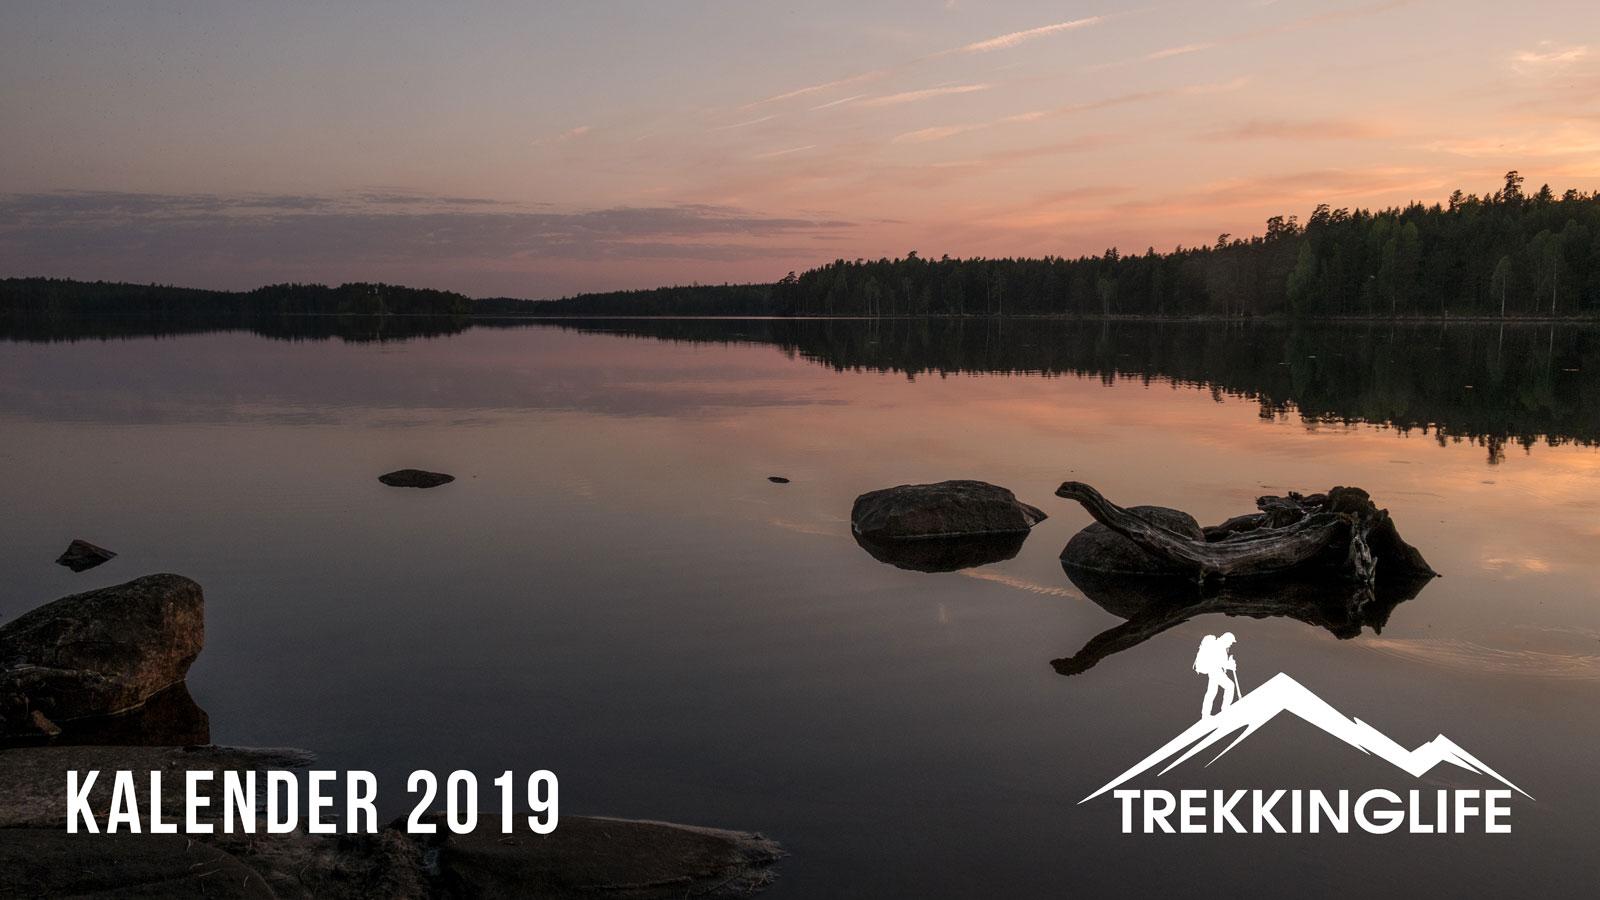 Kalender-2019-COver